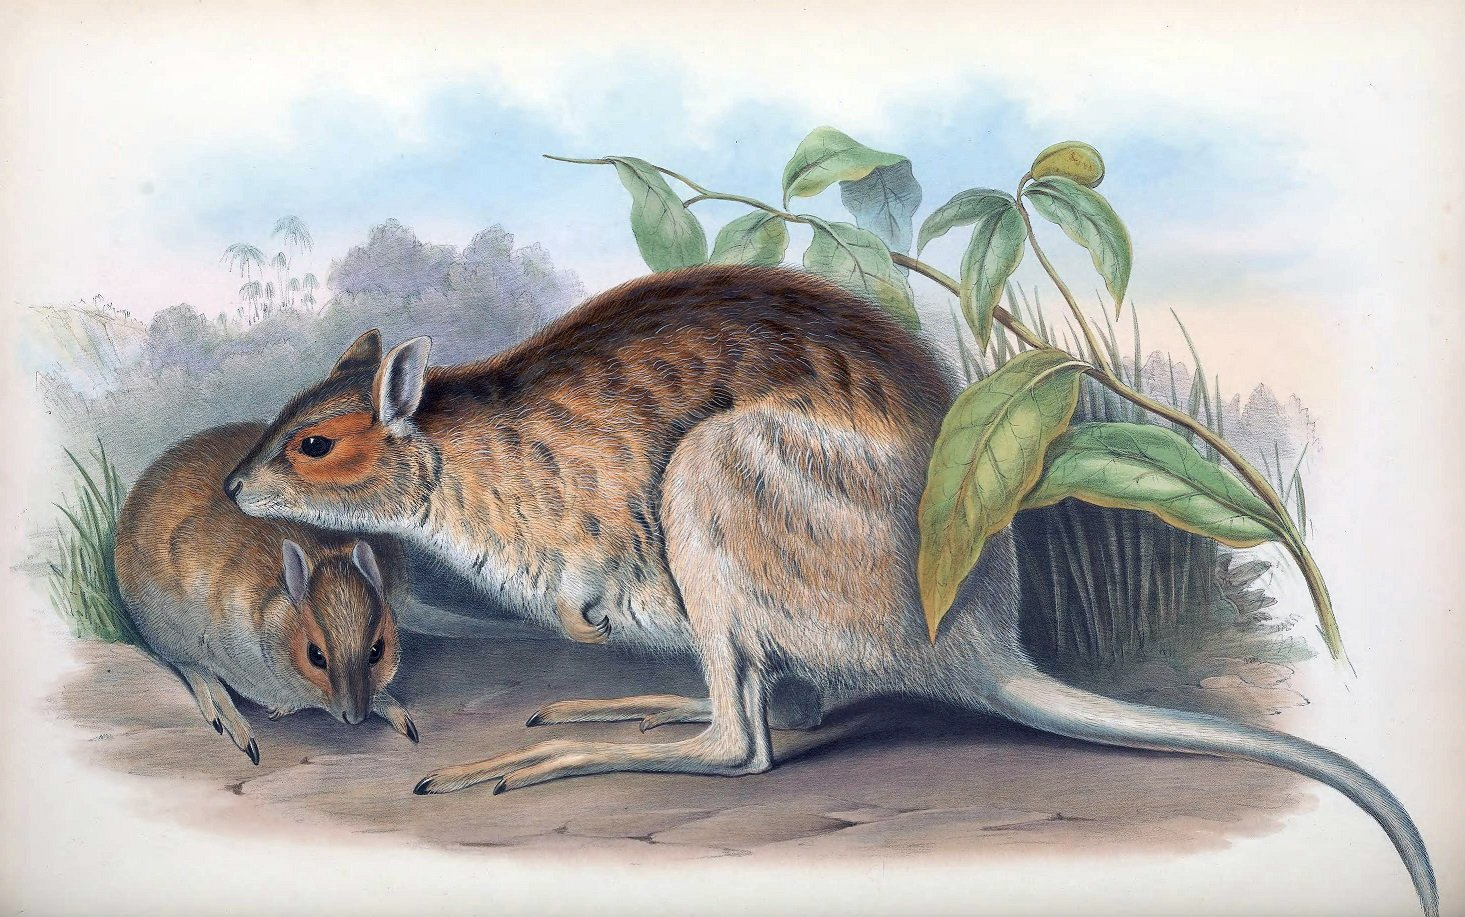 Brillen Hasenkänguru Illustration